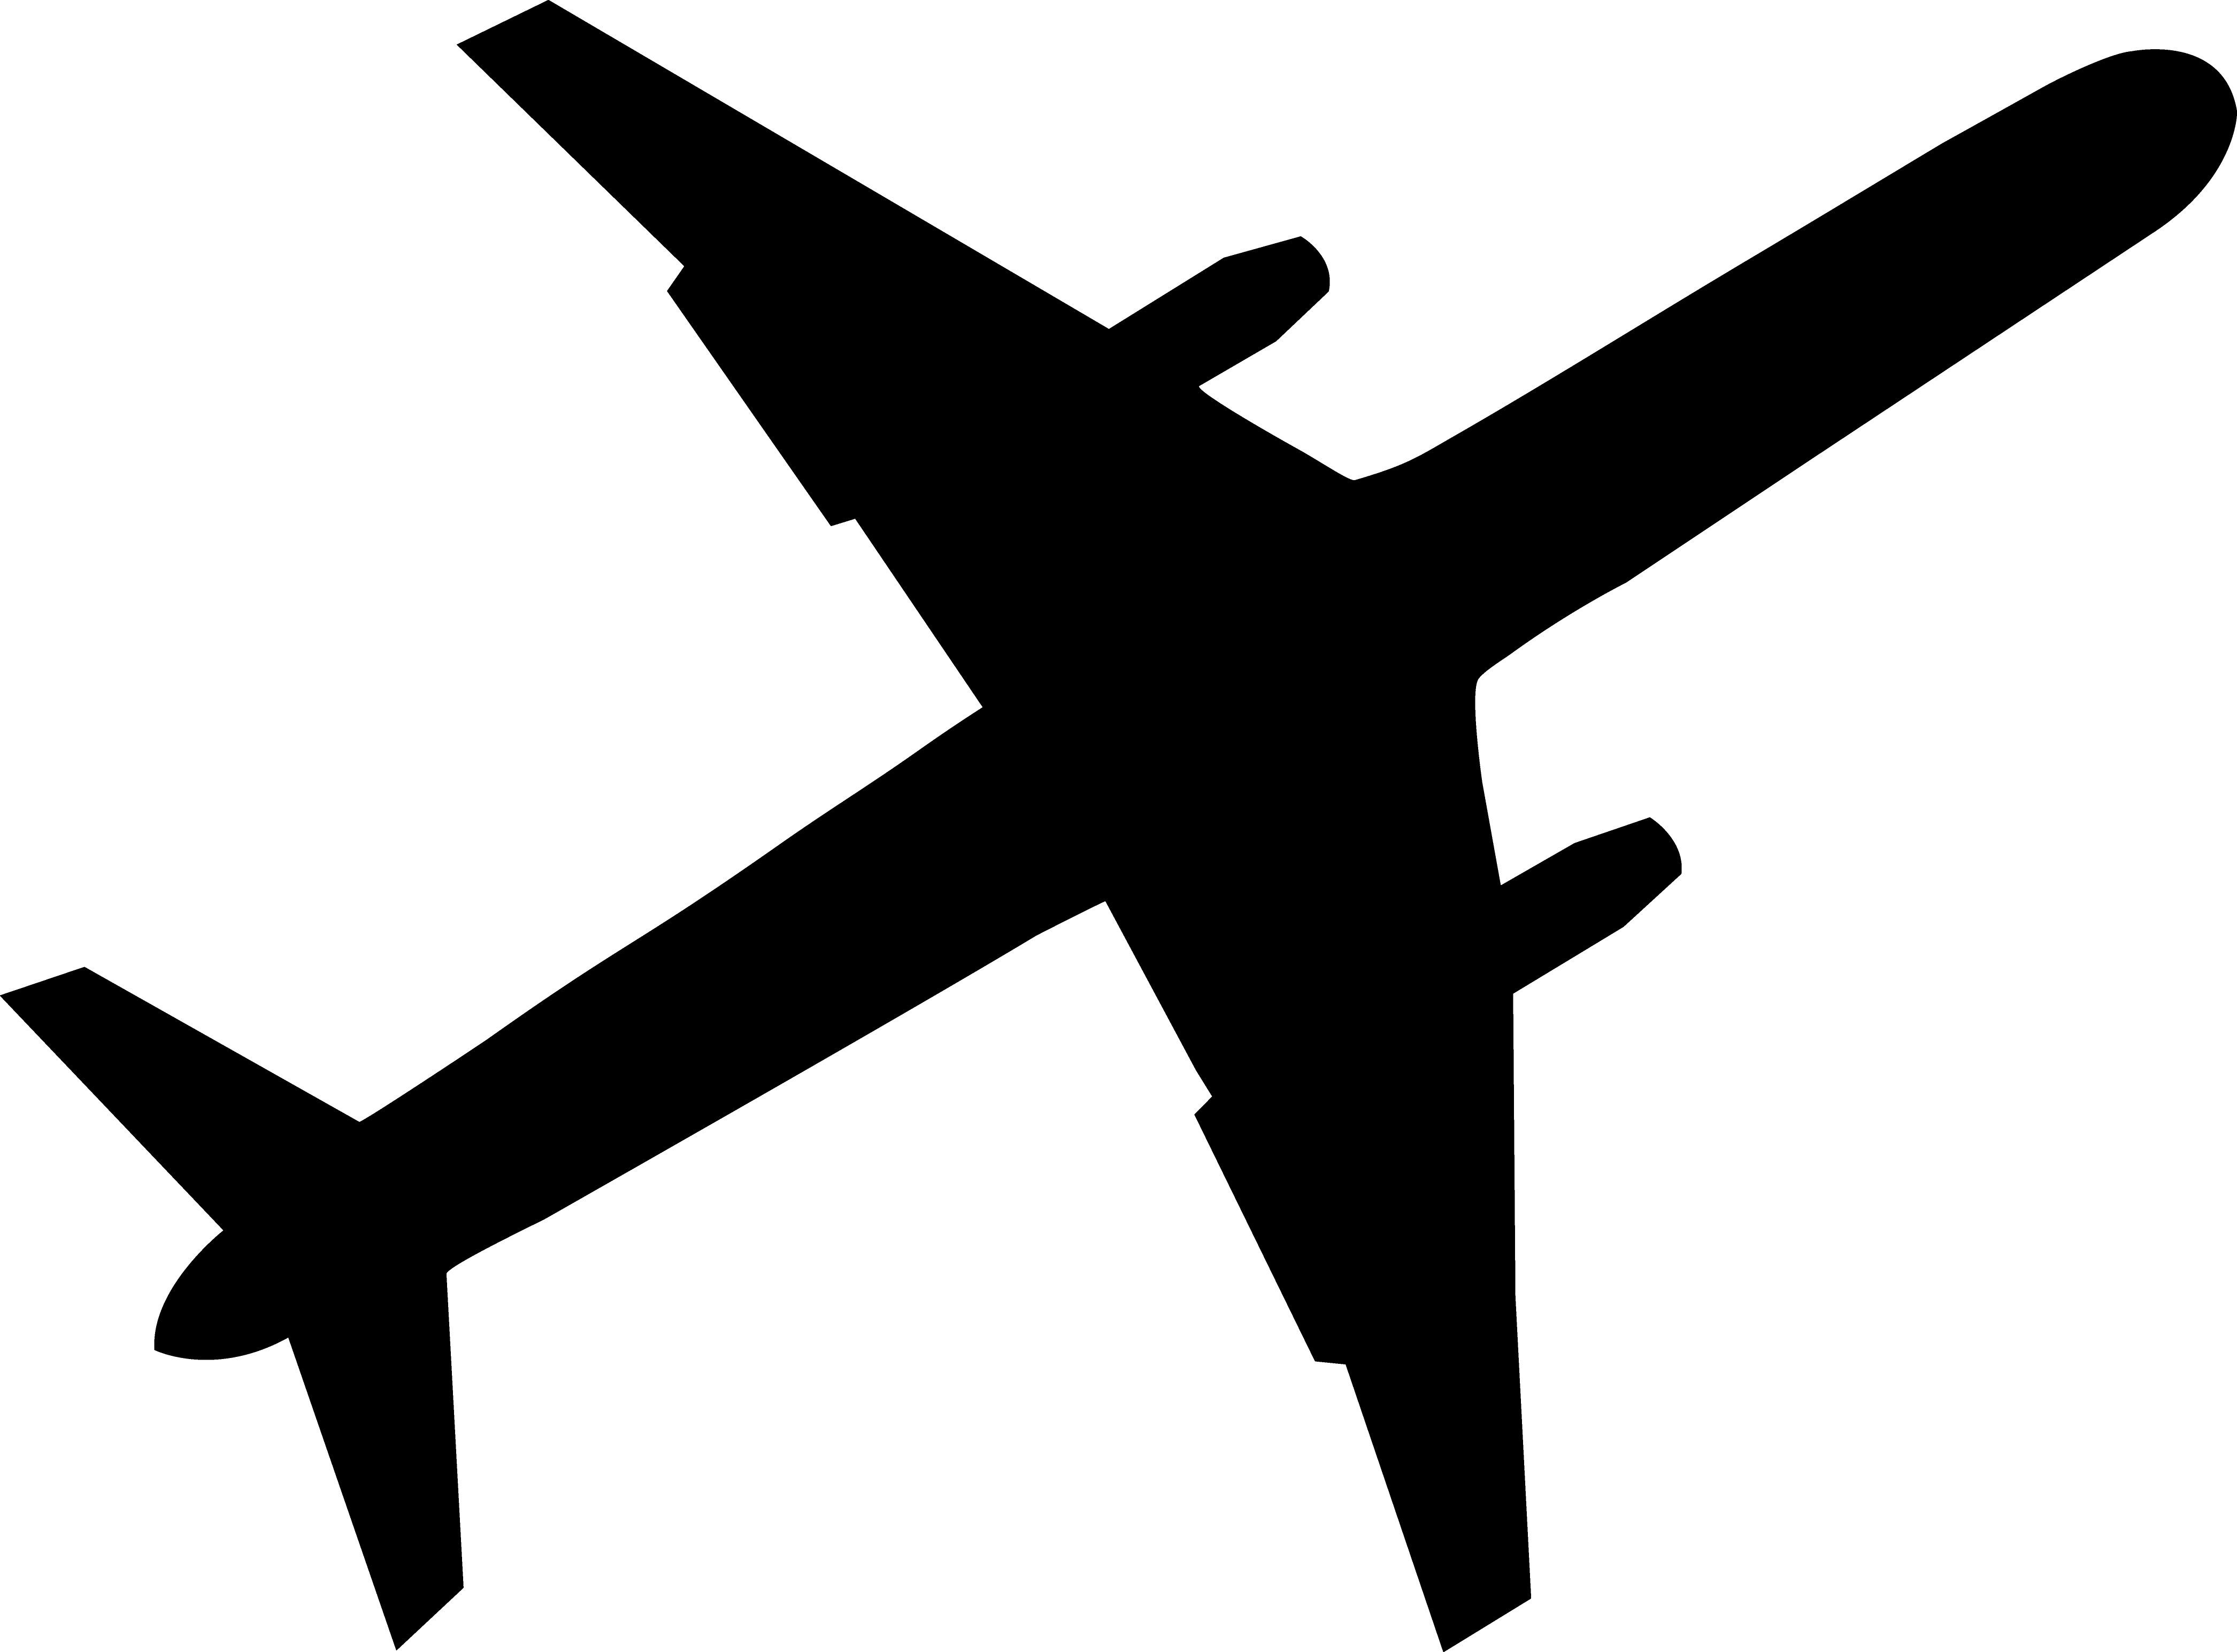 http://fatgayvegan.com/wp-content/uploads/2012/08/plane.jpg